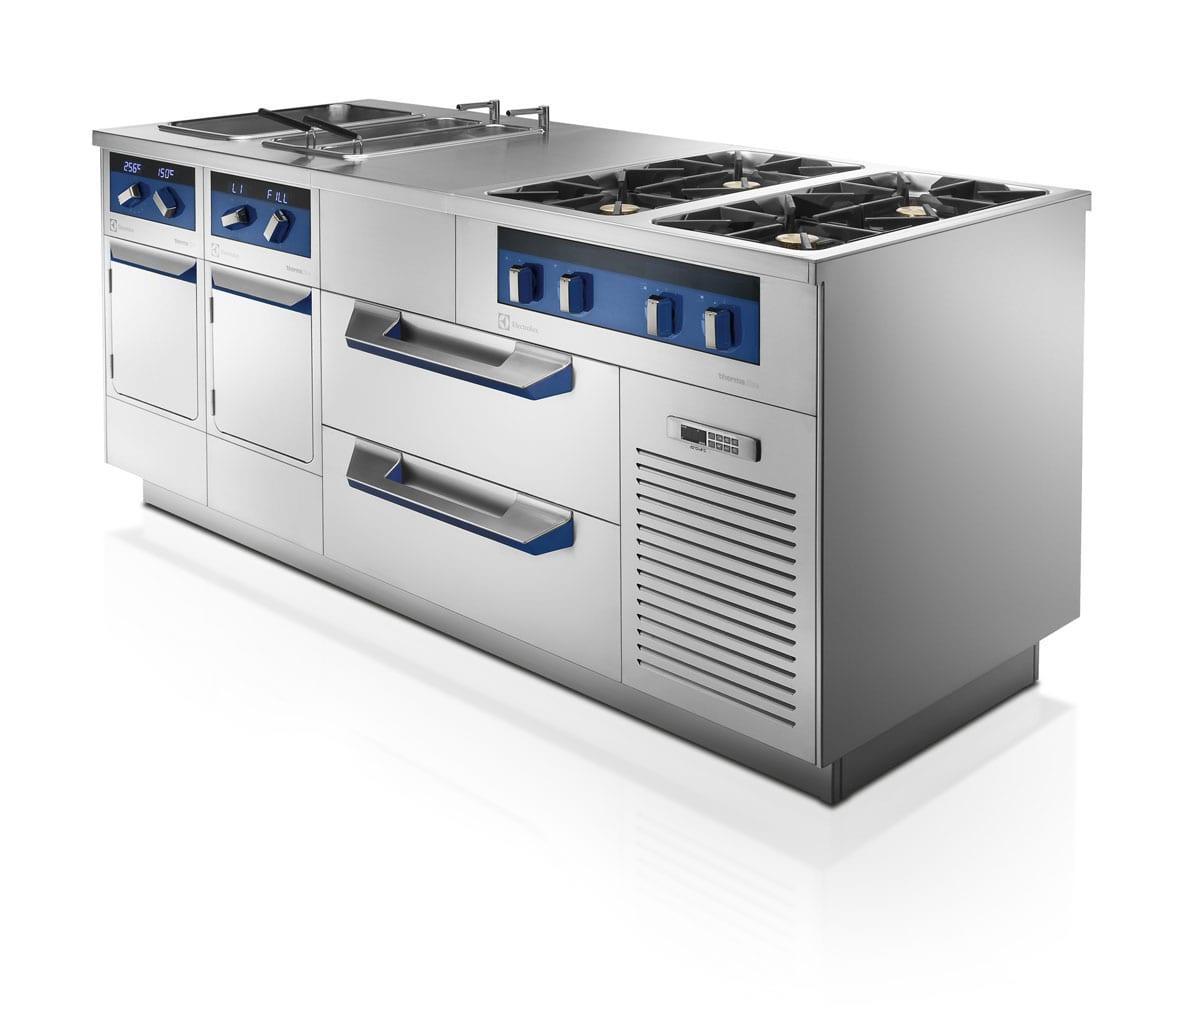 thermaline cooking range 80 90